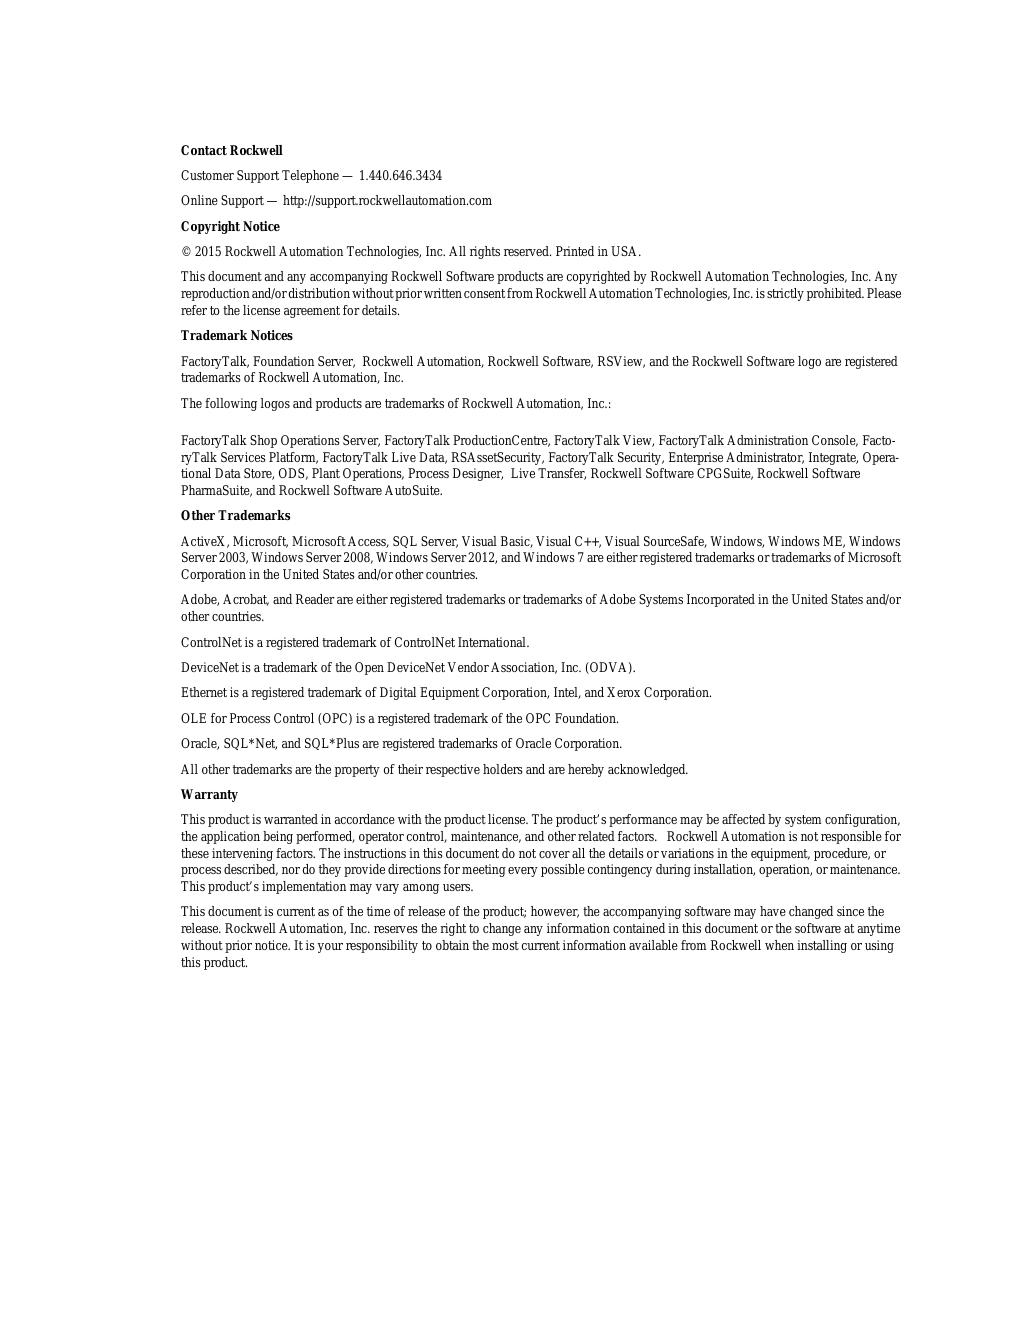 Factorytalk Performance Management User Guide